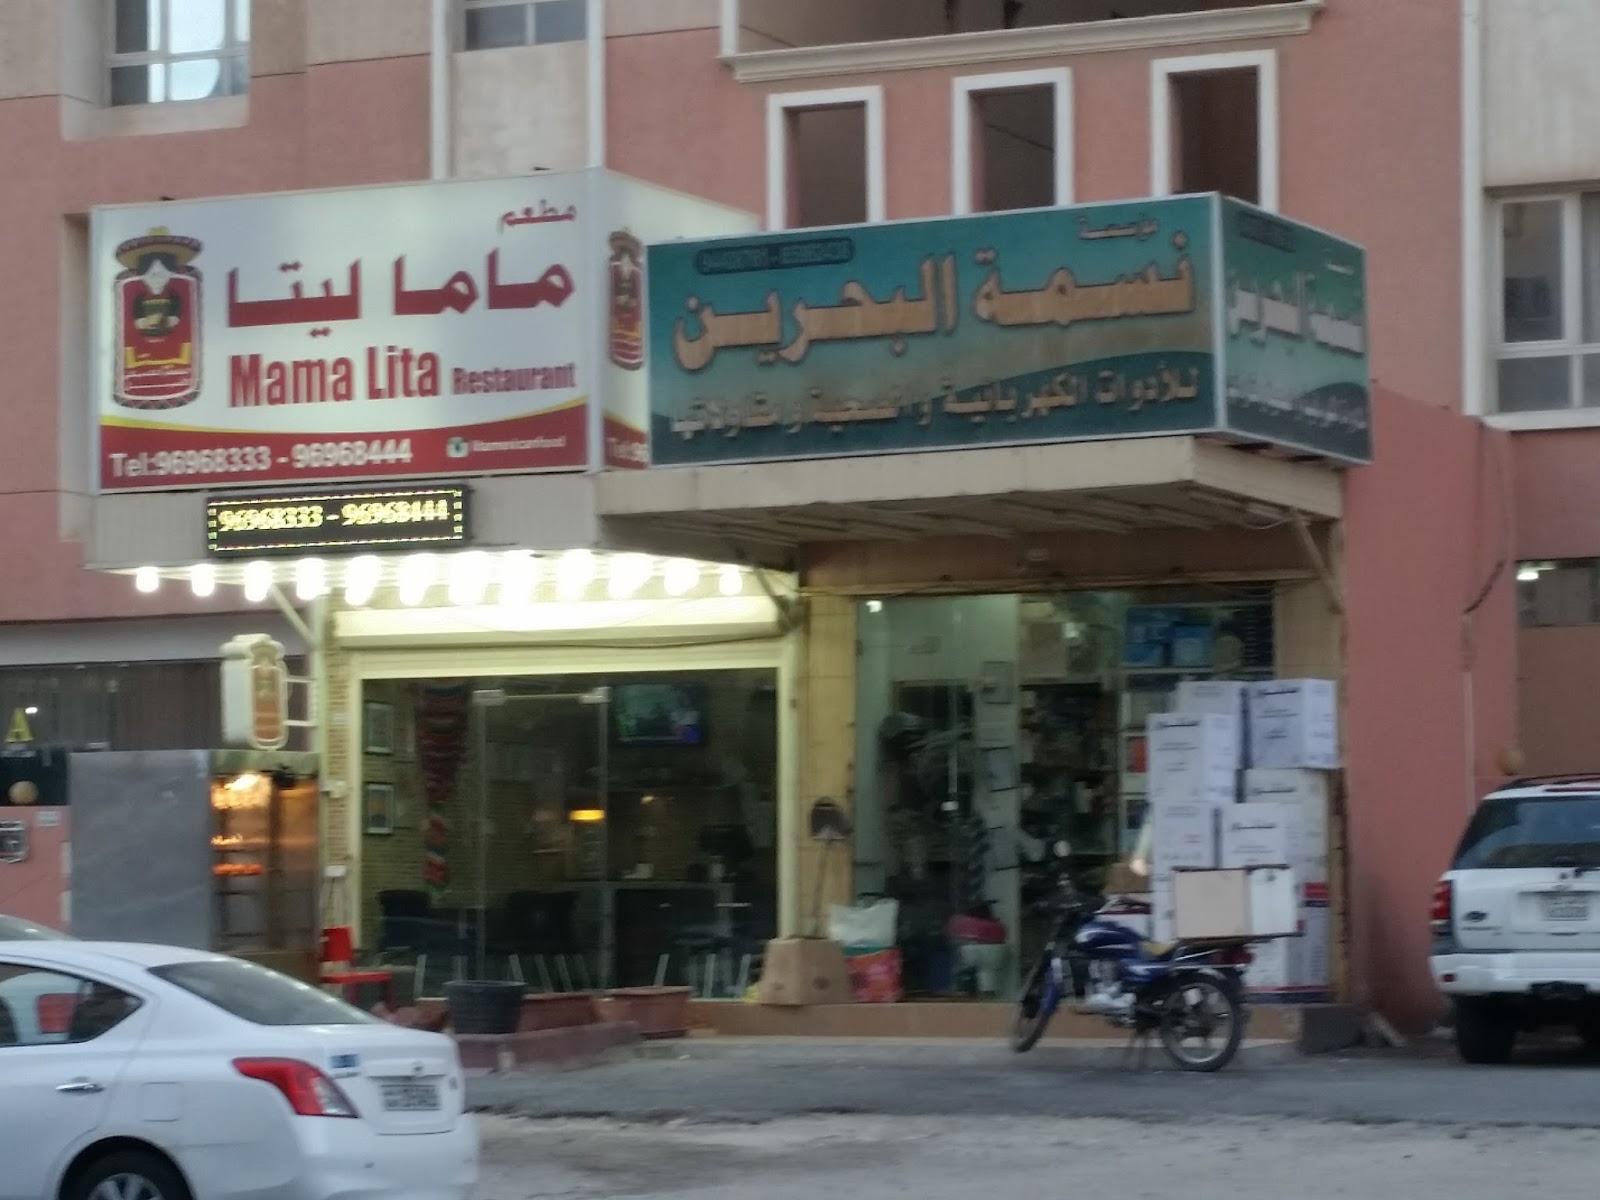 unfortunately in arabic